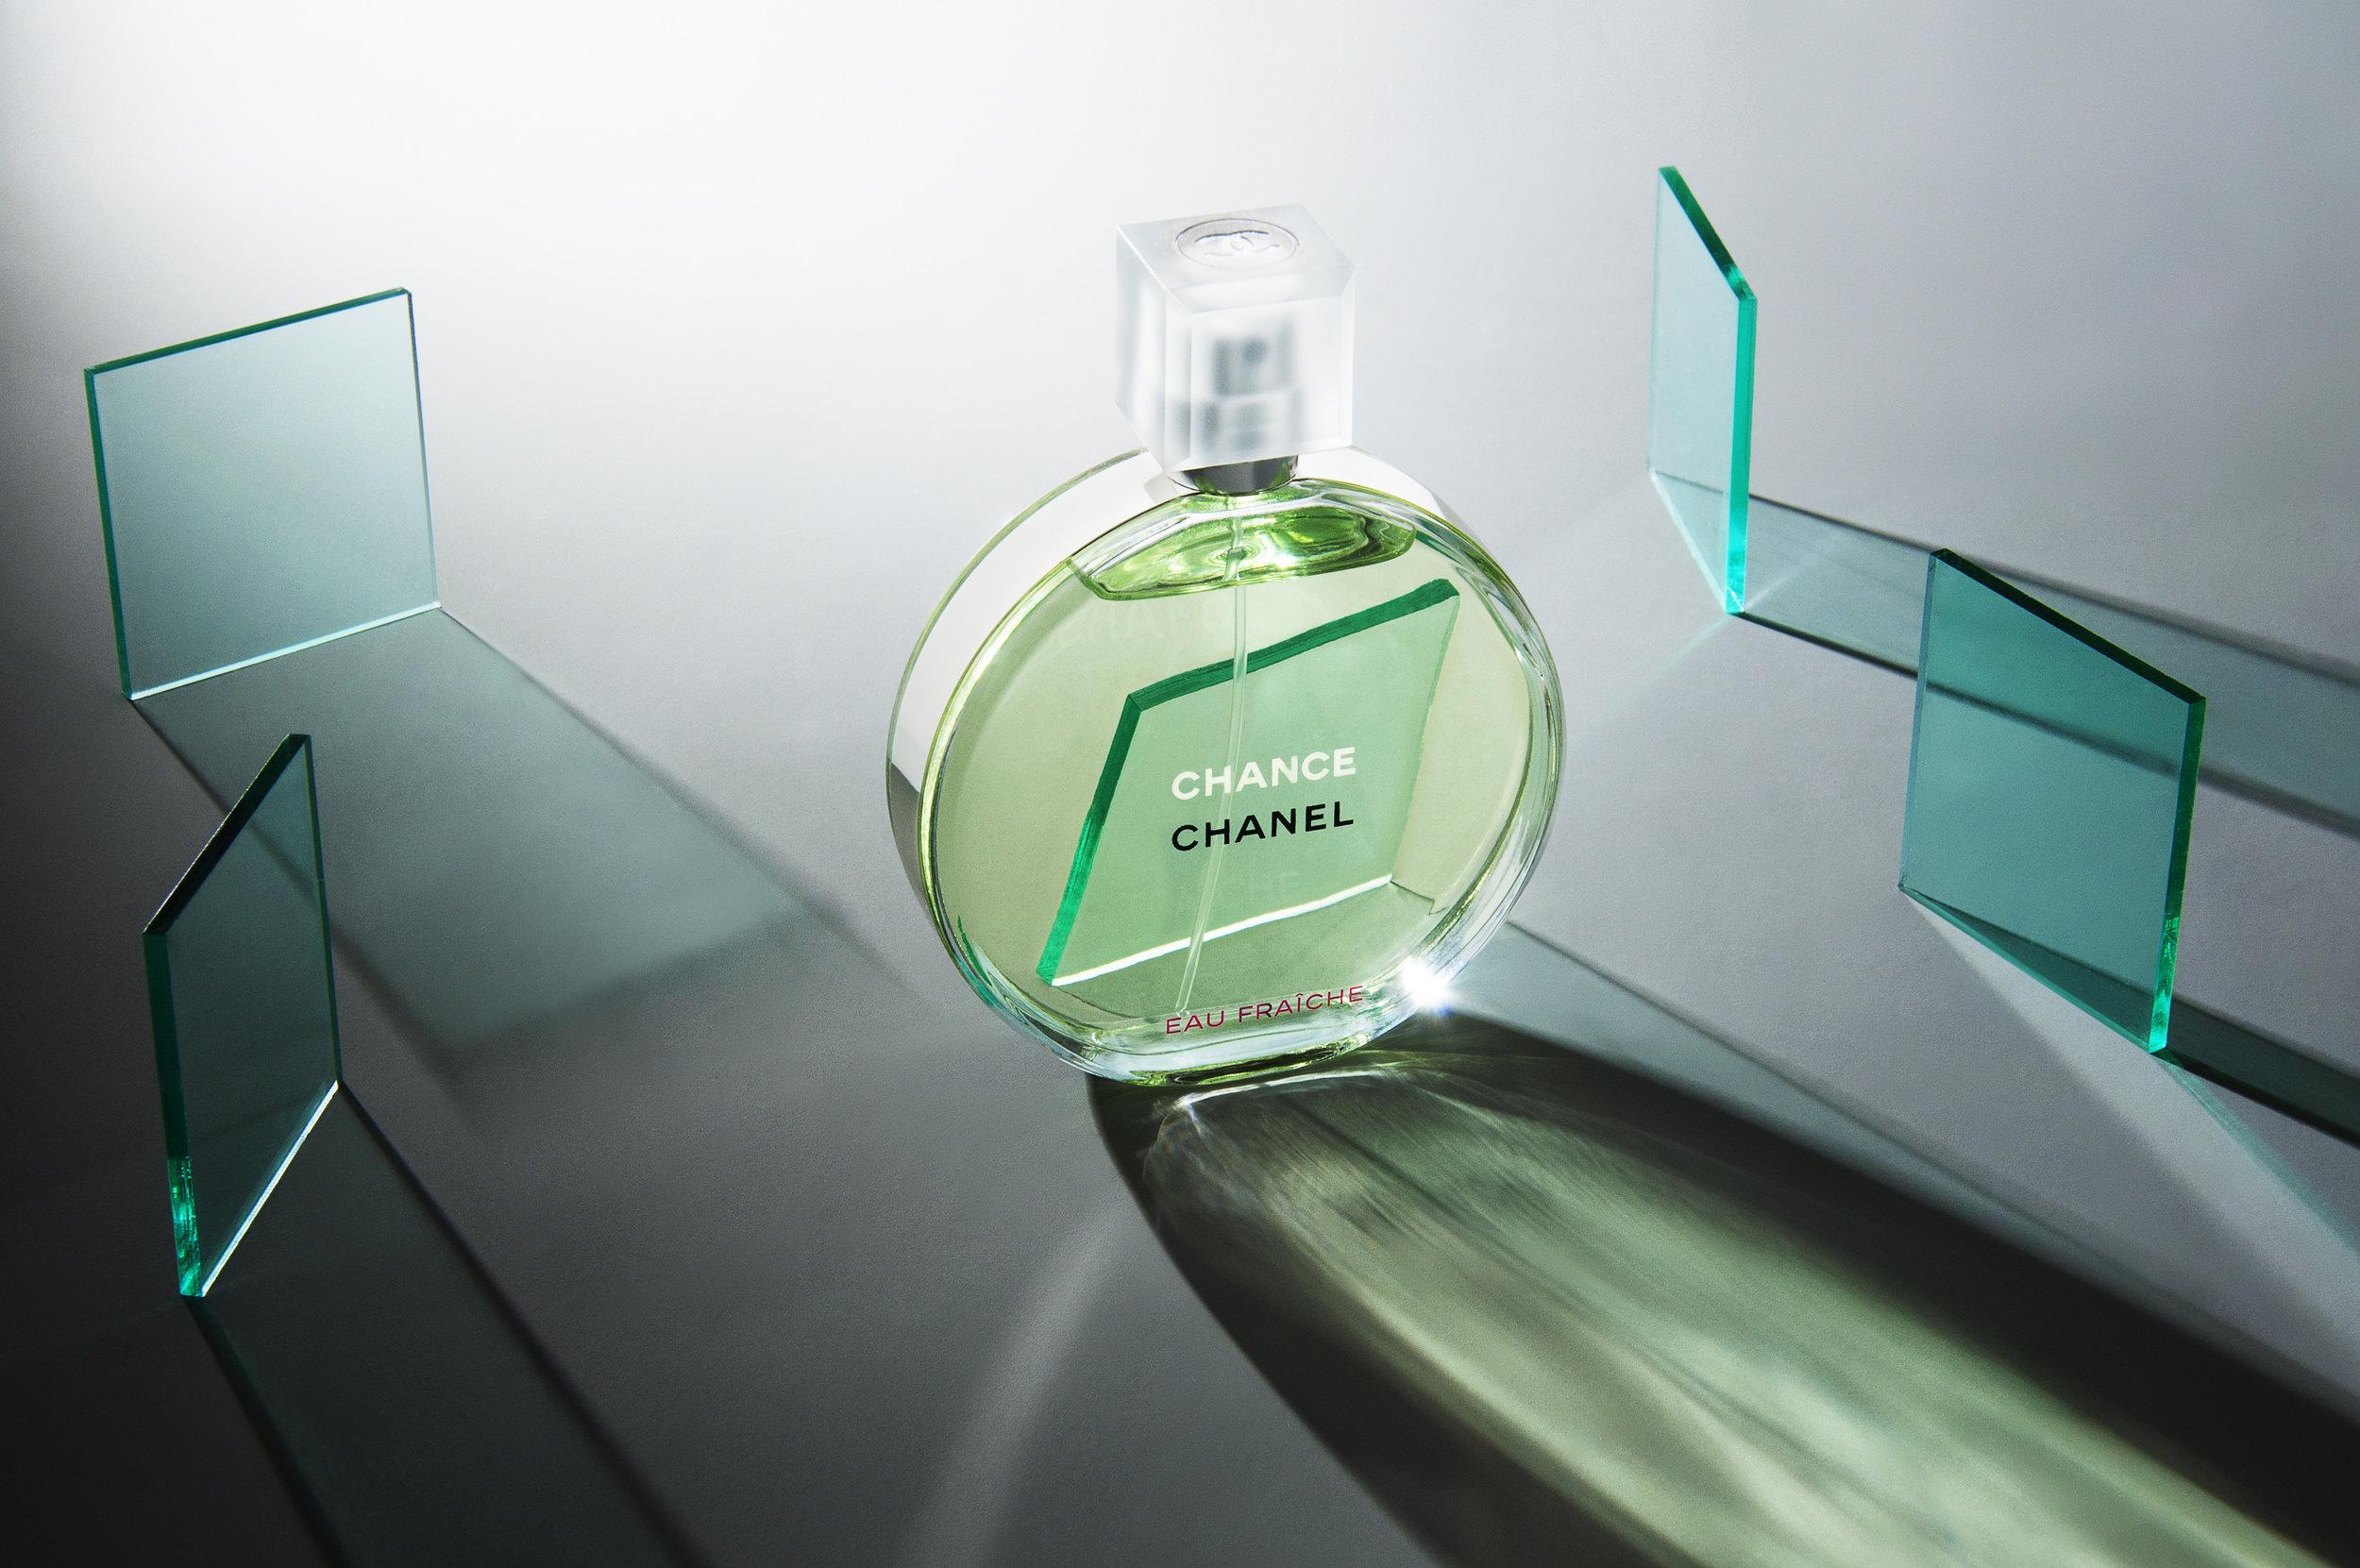 161119_Chanel Chance_268_A.jpg